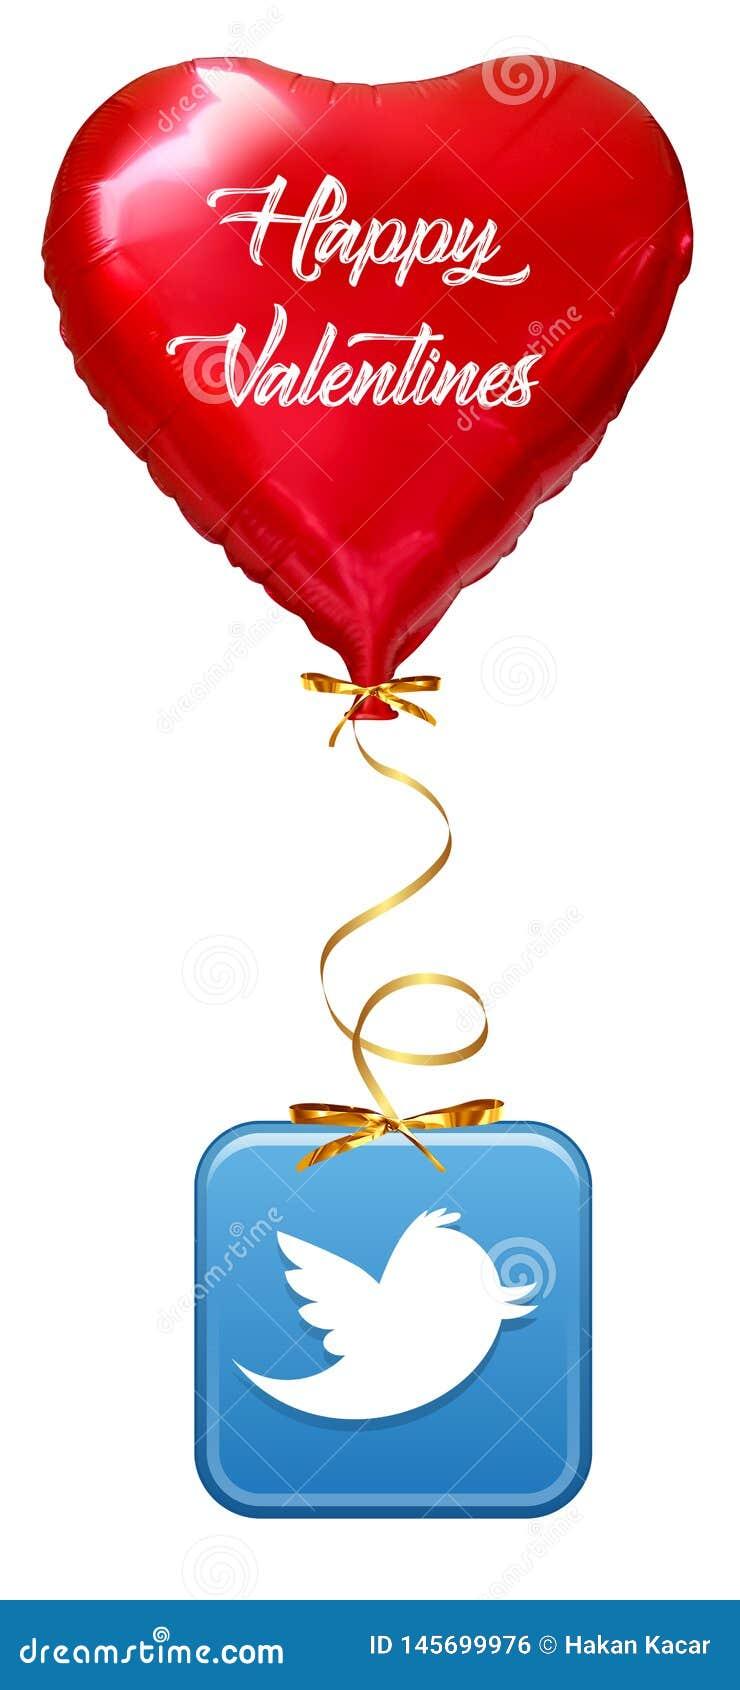 F?r?lskelse Baloon som isoleras p? vitt, Ballonhj?rta: r?tt valentinf?r?lskelsebegrepp, valentindag ısolated